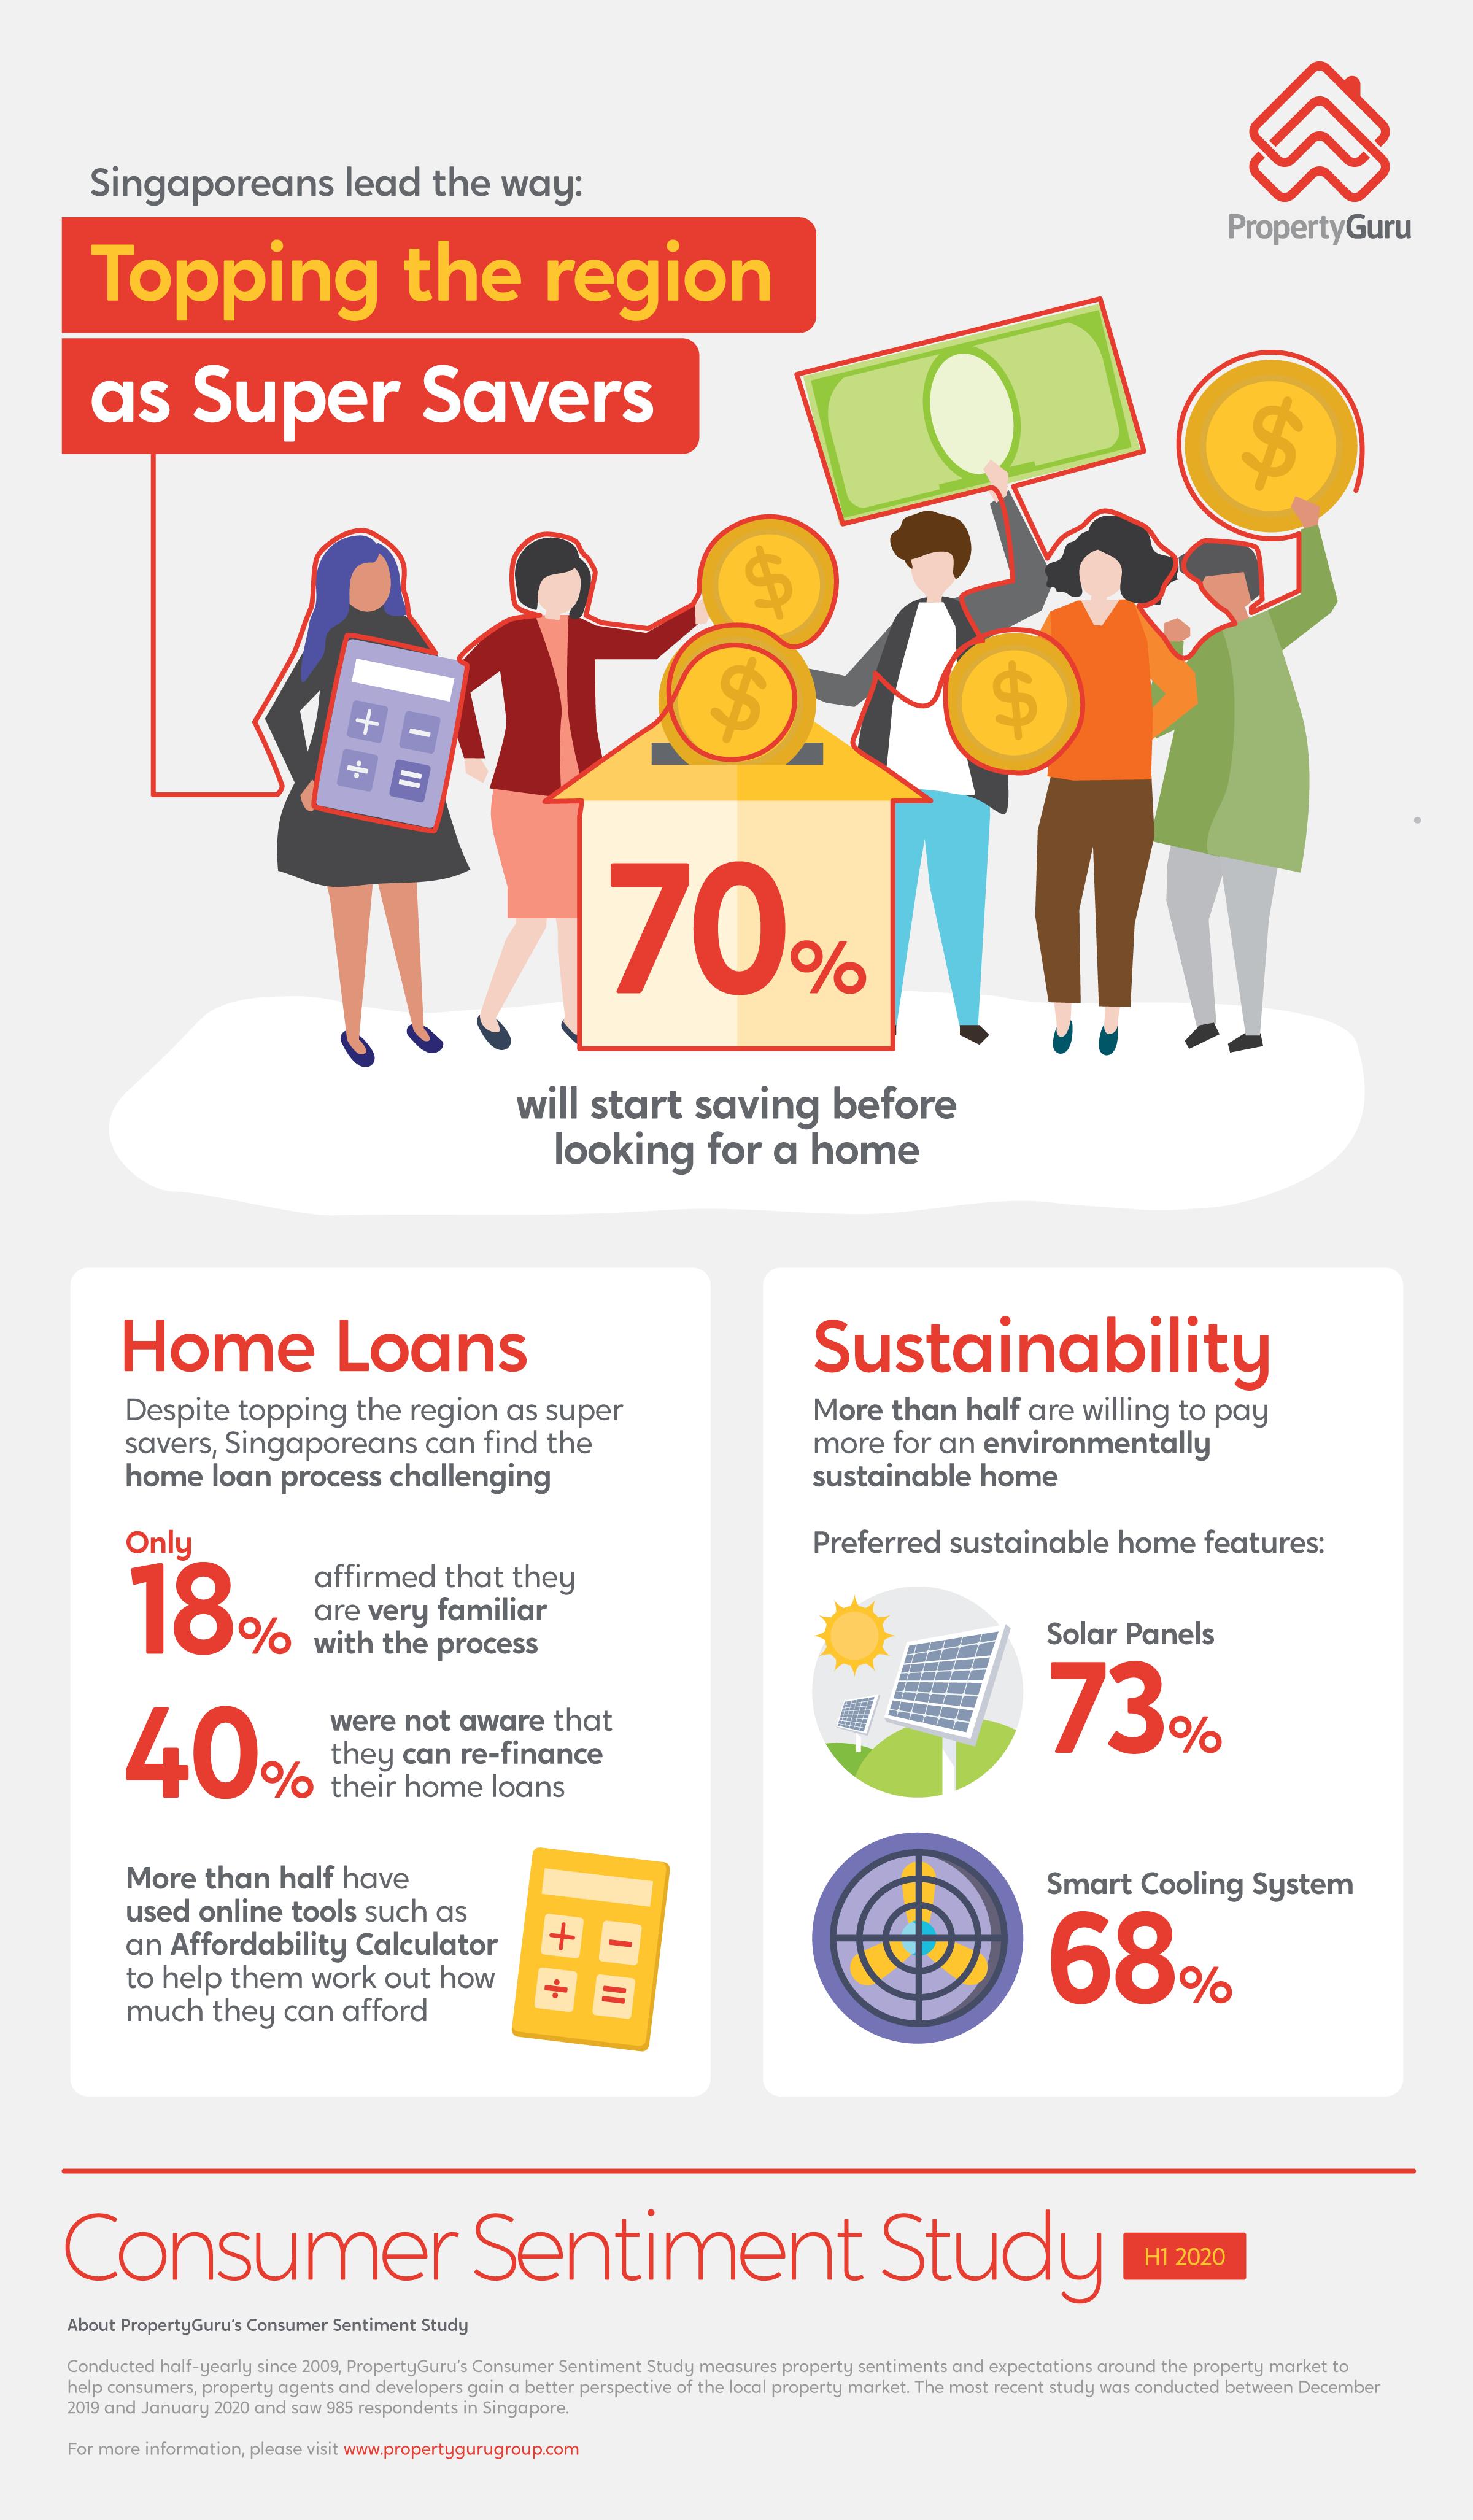 Consumer Sentiment Survey H1 2020 infographic